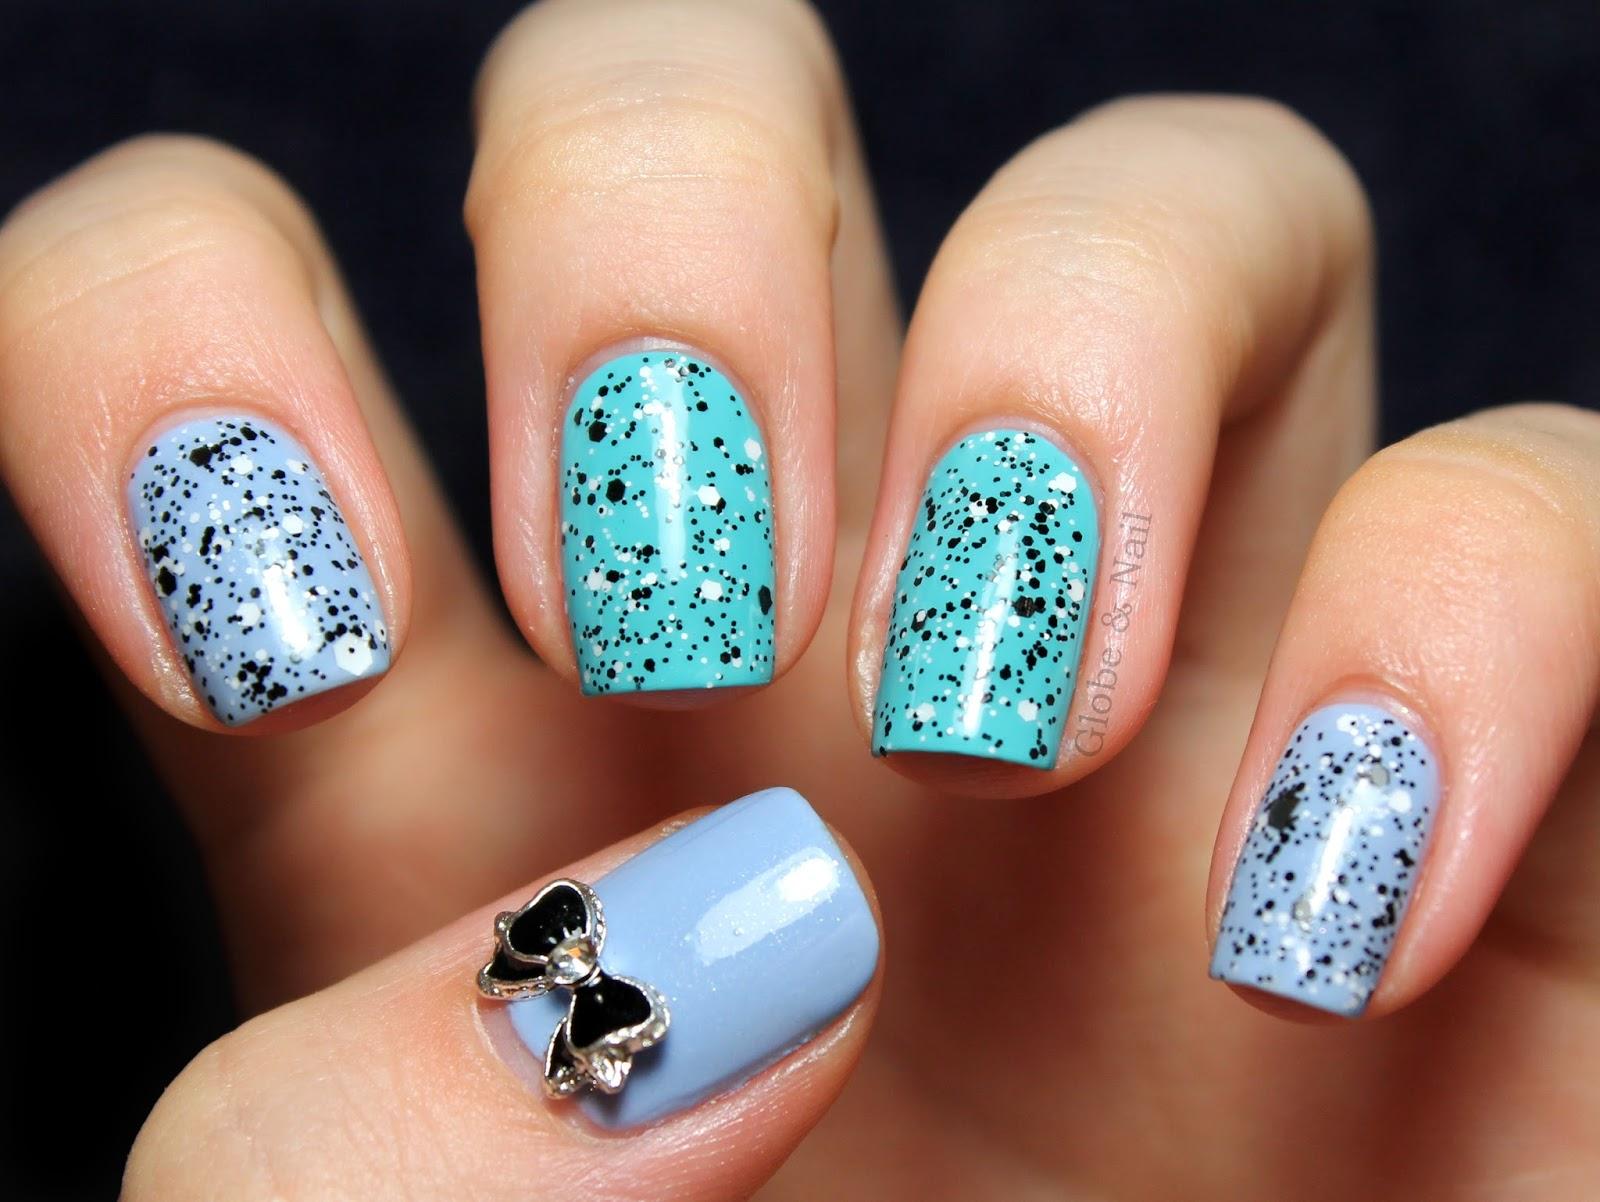 Acrylic Nailsnails Pinterestnails Tumblrhalloween Nails3d Nails